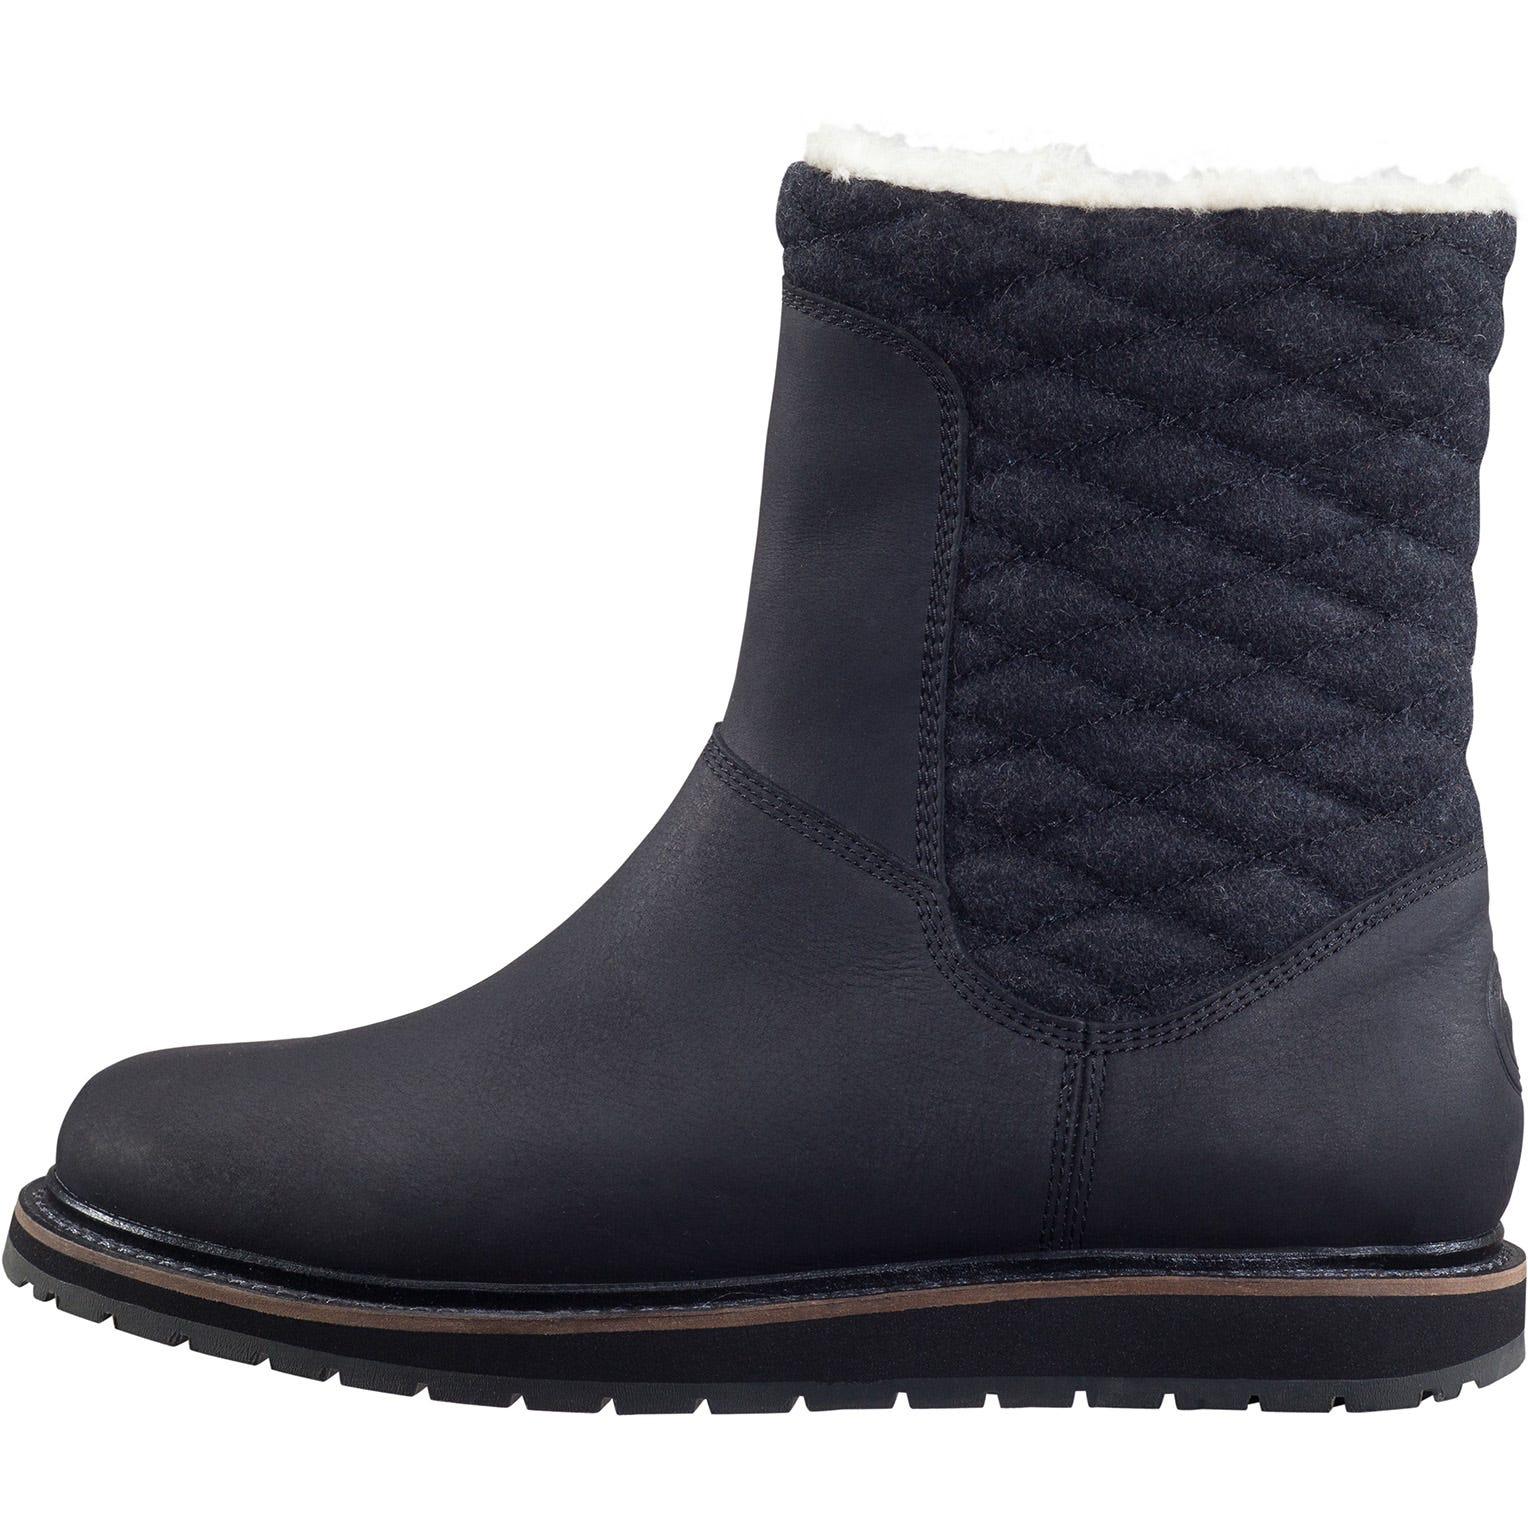 Helly Hansen W Seraphina Womens Winter Boot Black 39.3/8